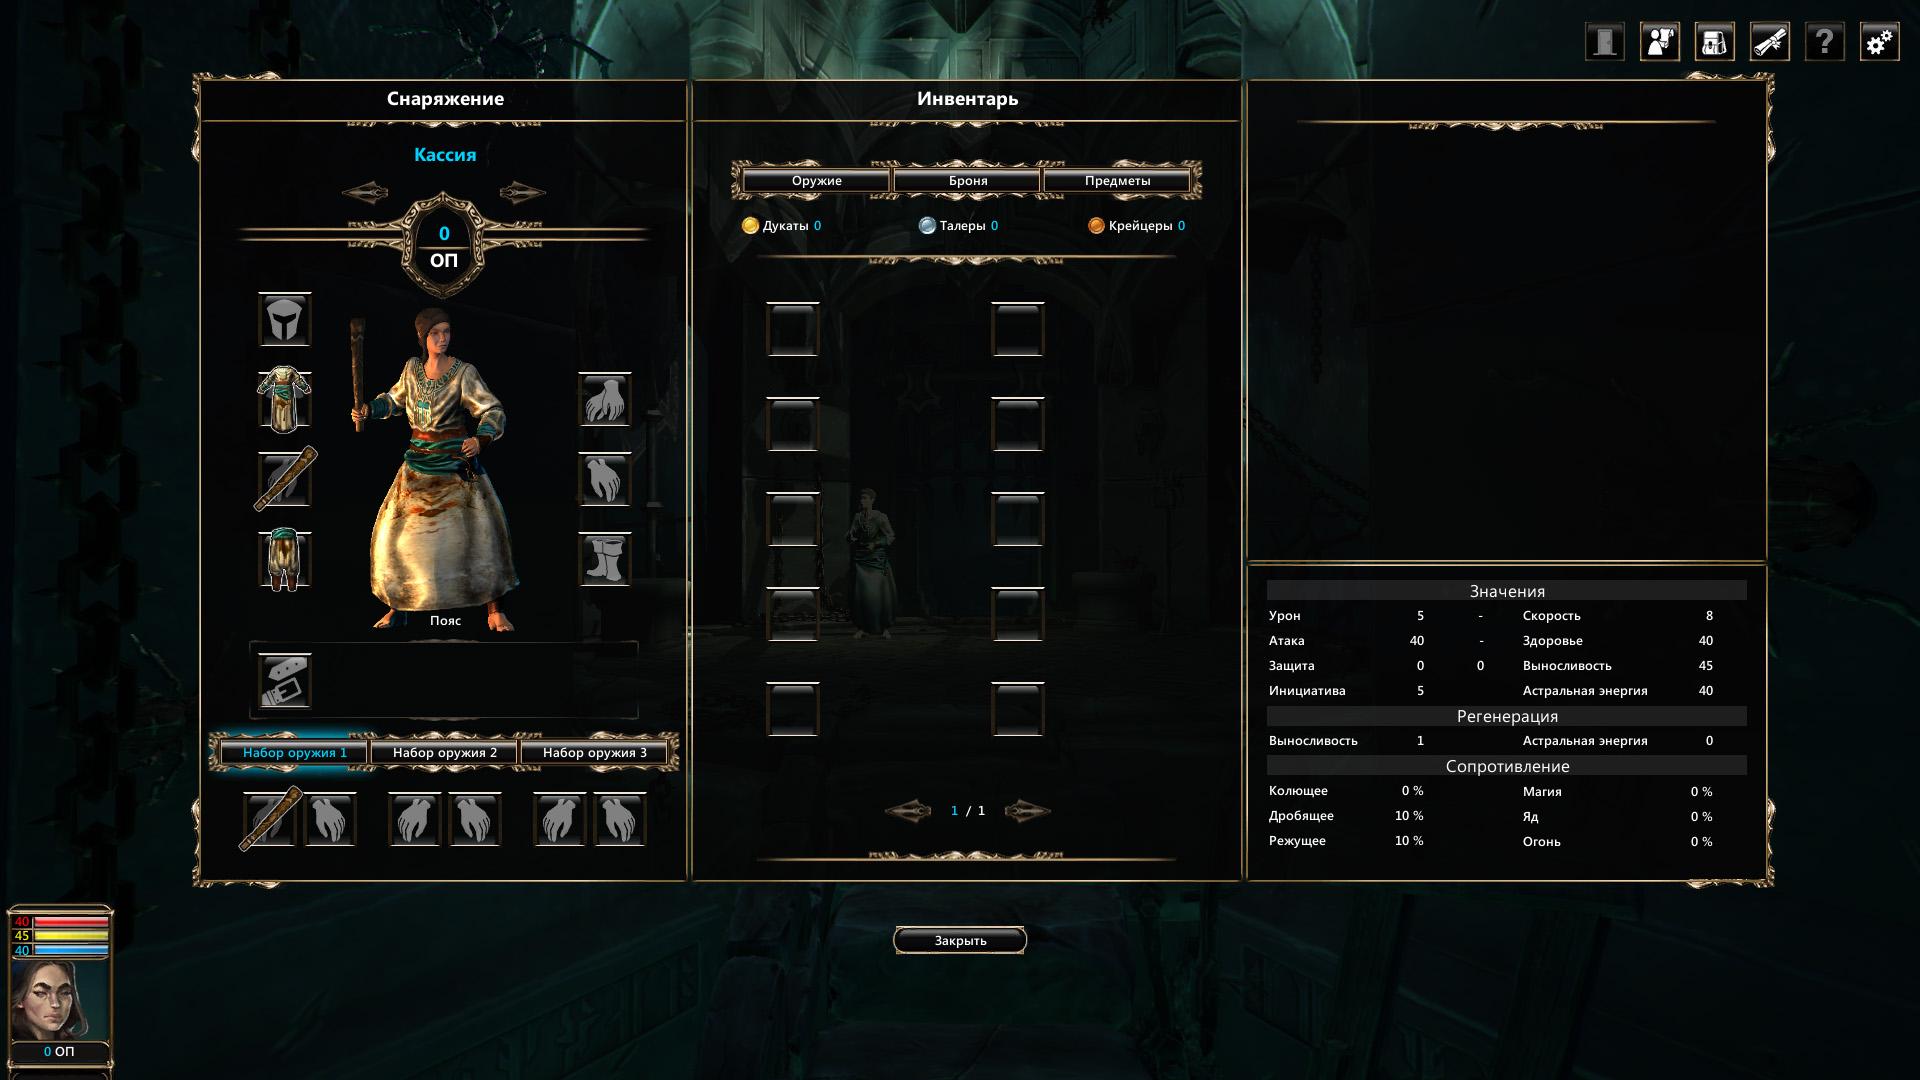 Скриншот Blackguards 2 [v 2.5.9139] (2015) PC